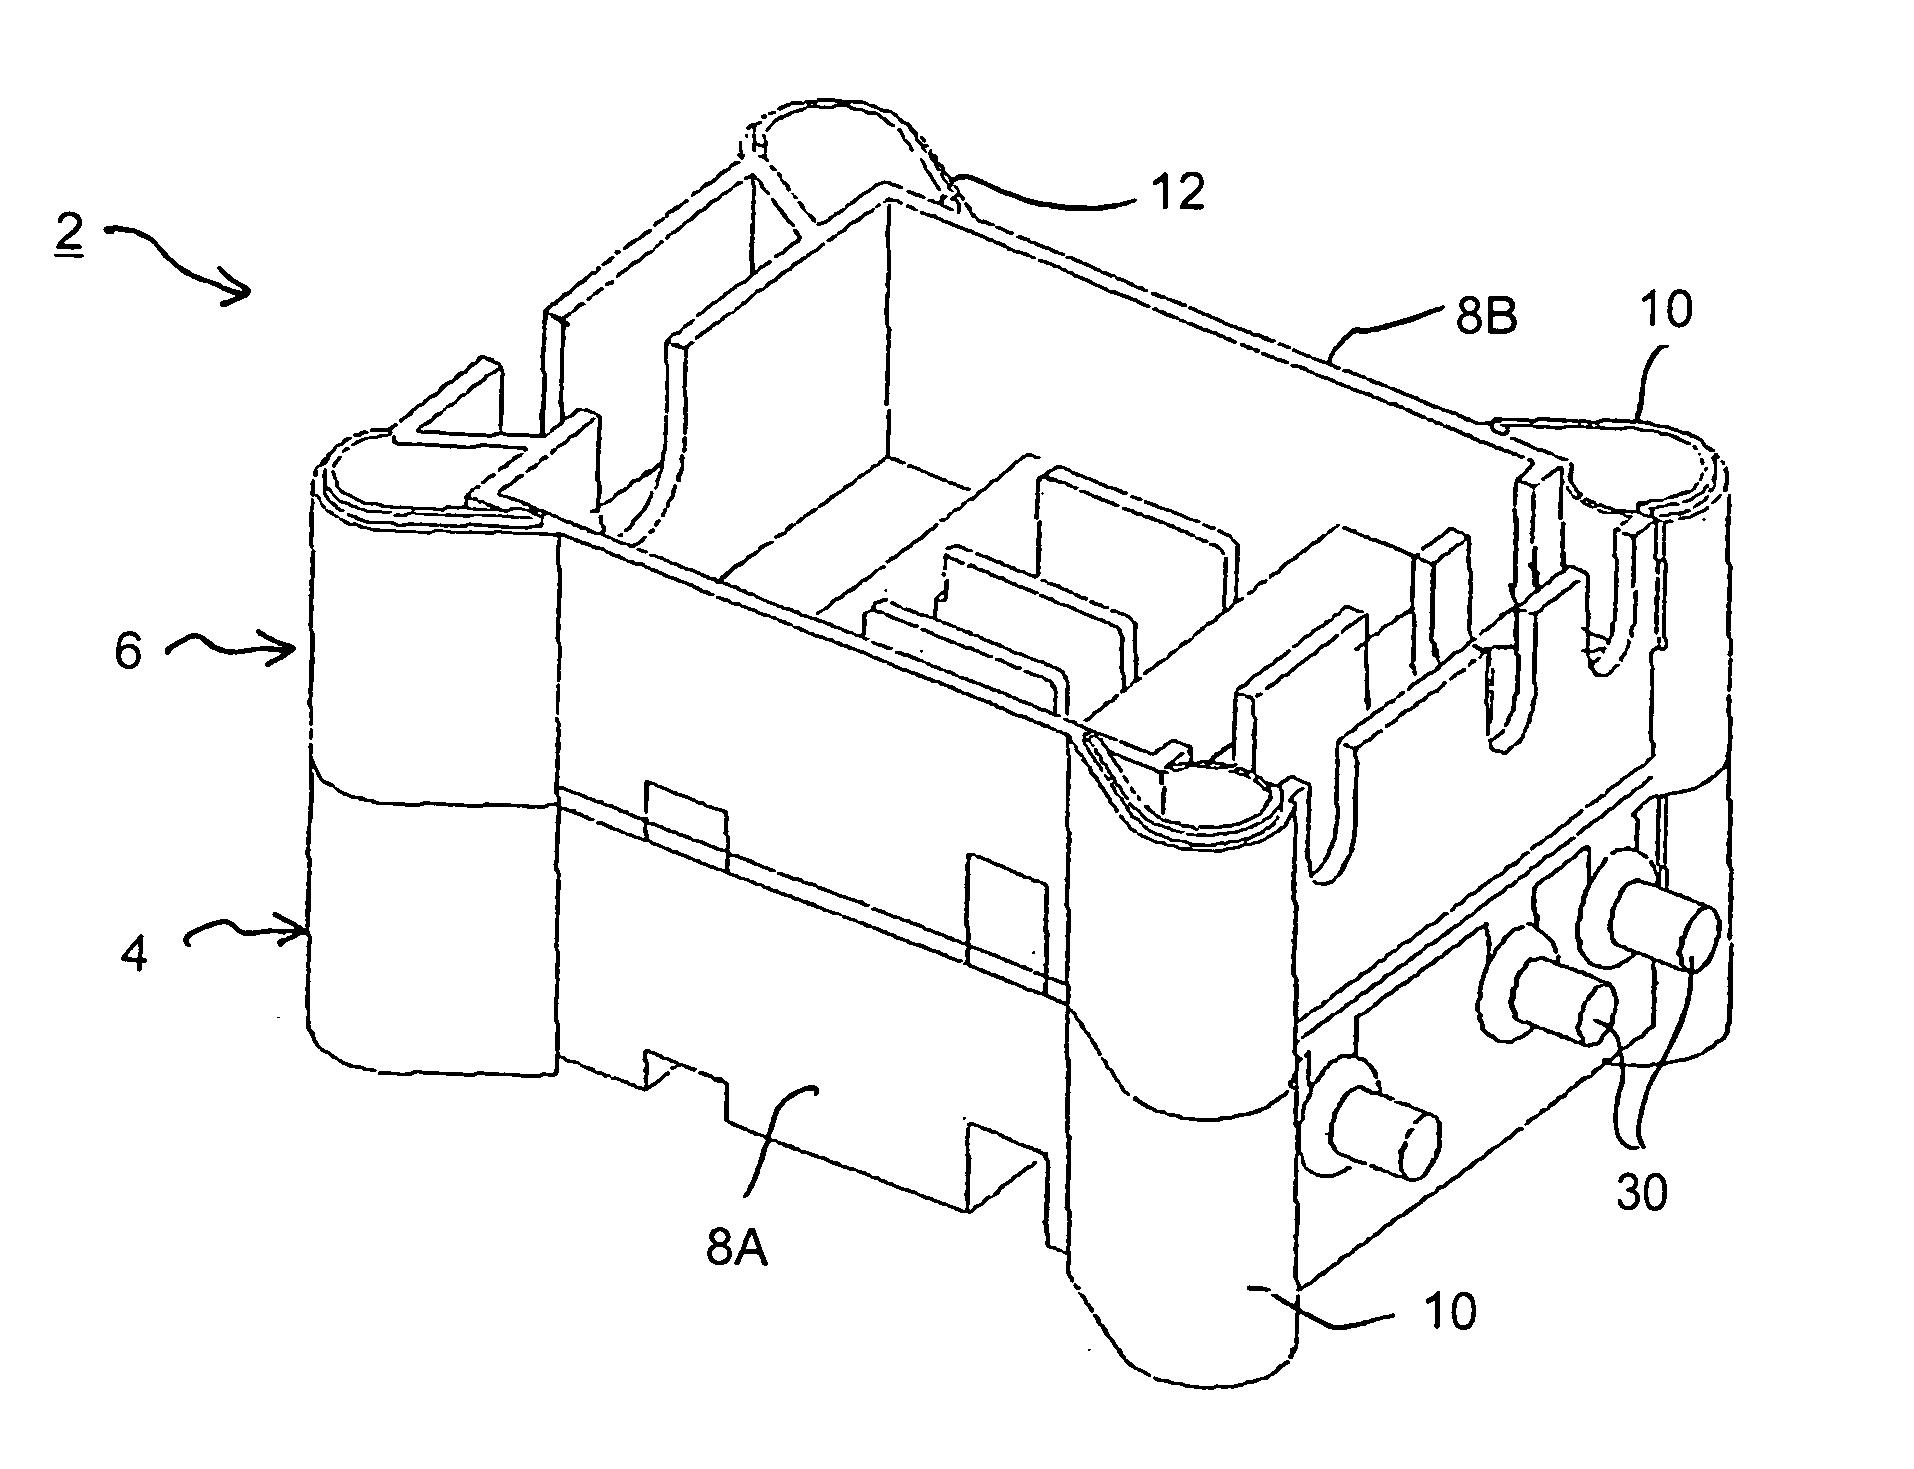 patente us20040252446 fuse box for a vehicle google patentes on simple auto fuse box